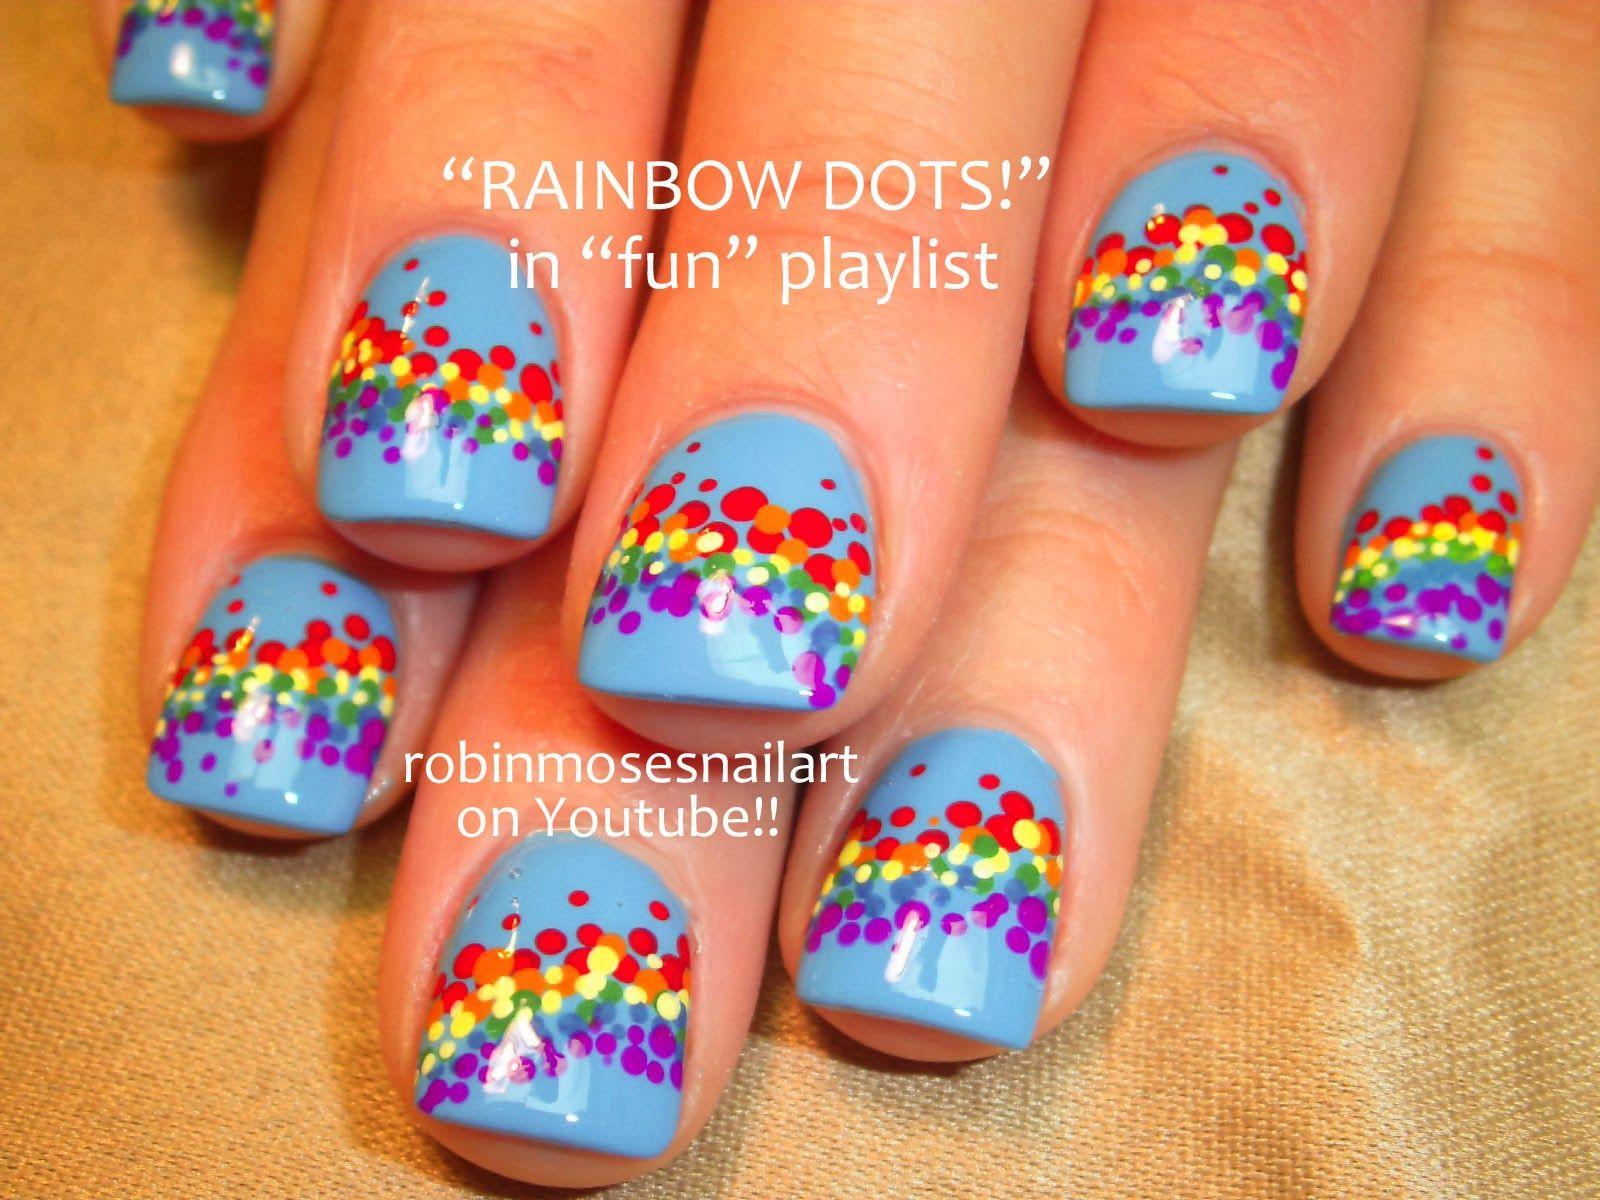 Rainbow nails rainbow nail art dog paw nails rainbow heart rainbow nails rainbow nail art dog paw nails rainbow heart nails pride nails lgbt nails diy nails diy rainbow nails nailart ideas designs solutioingenieria Choice Image